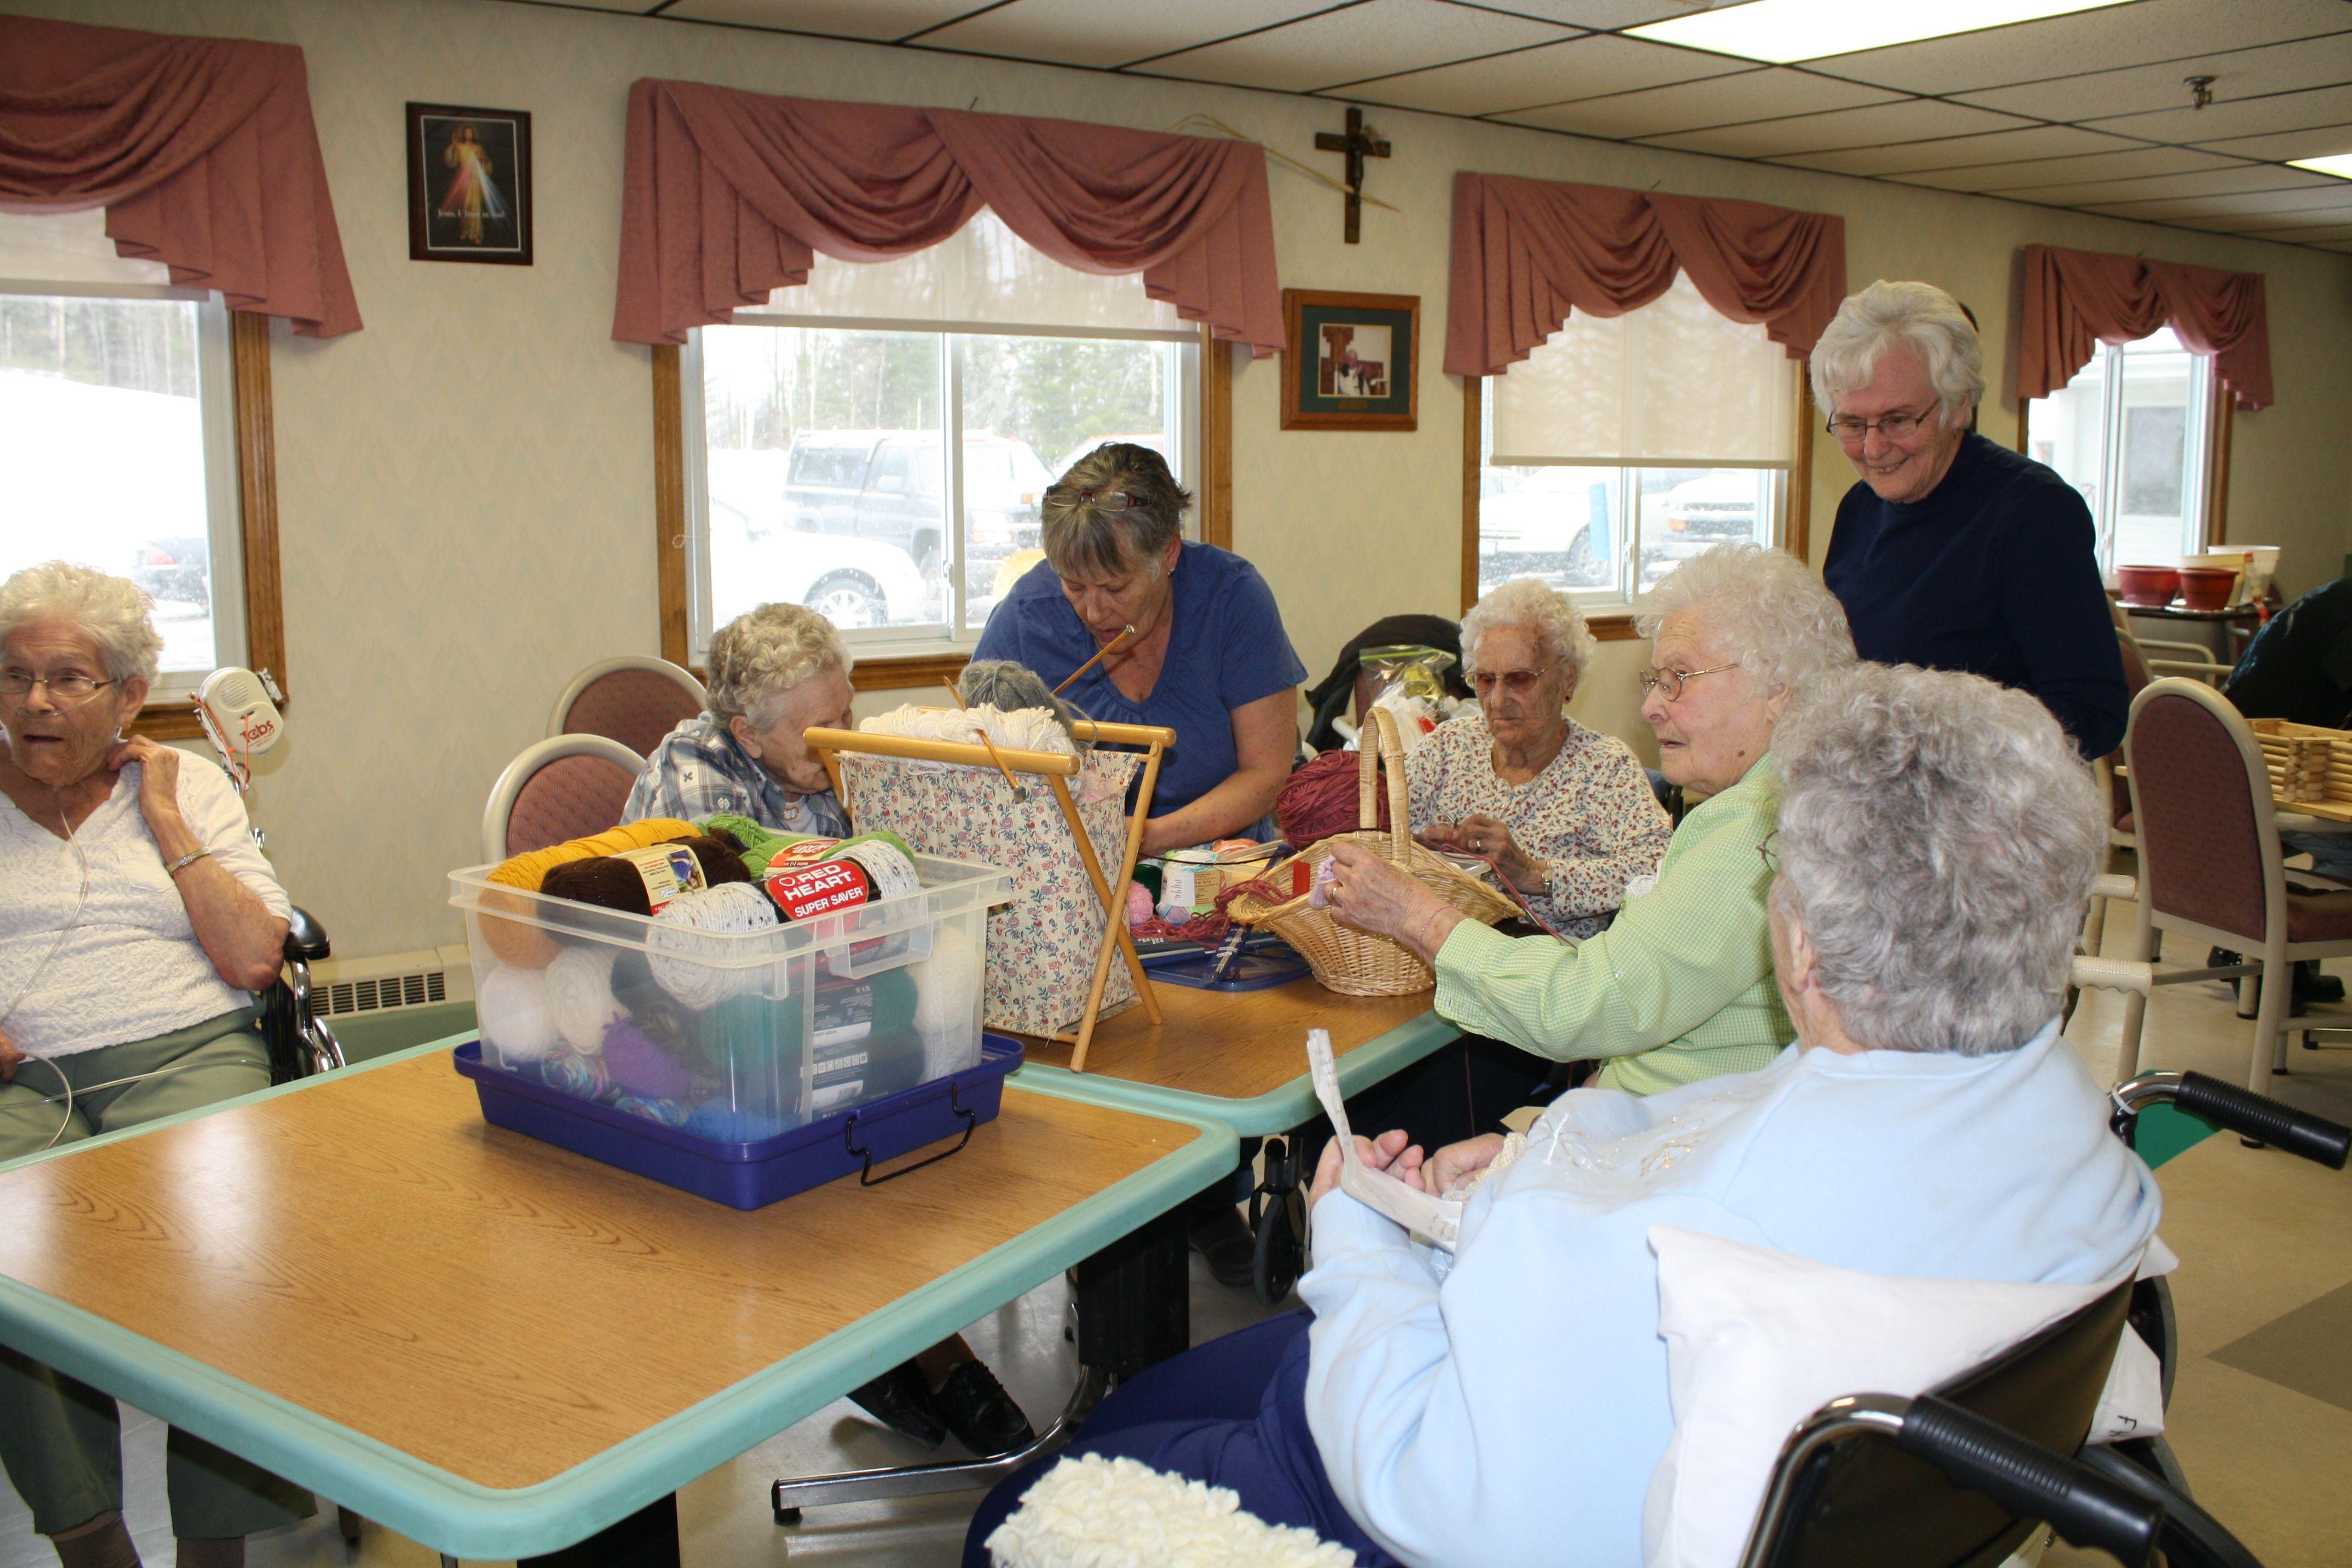 The 25 best senior citizen apartments ideas on pinterest yoga for seniors senior center and senior citizen activities